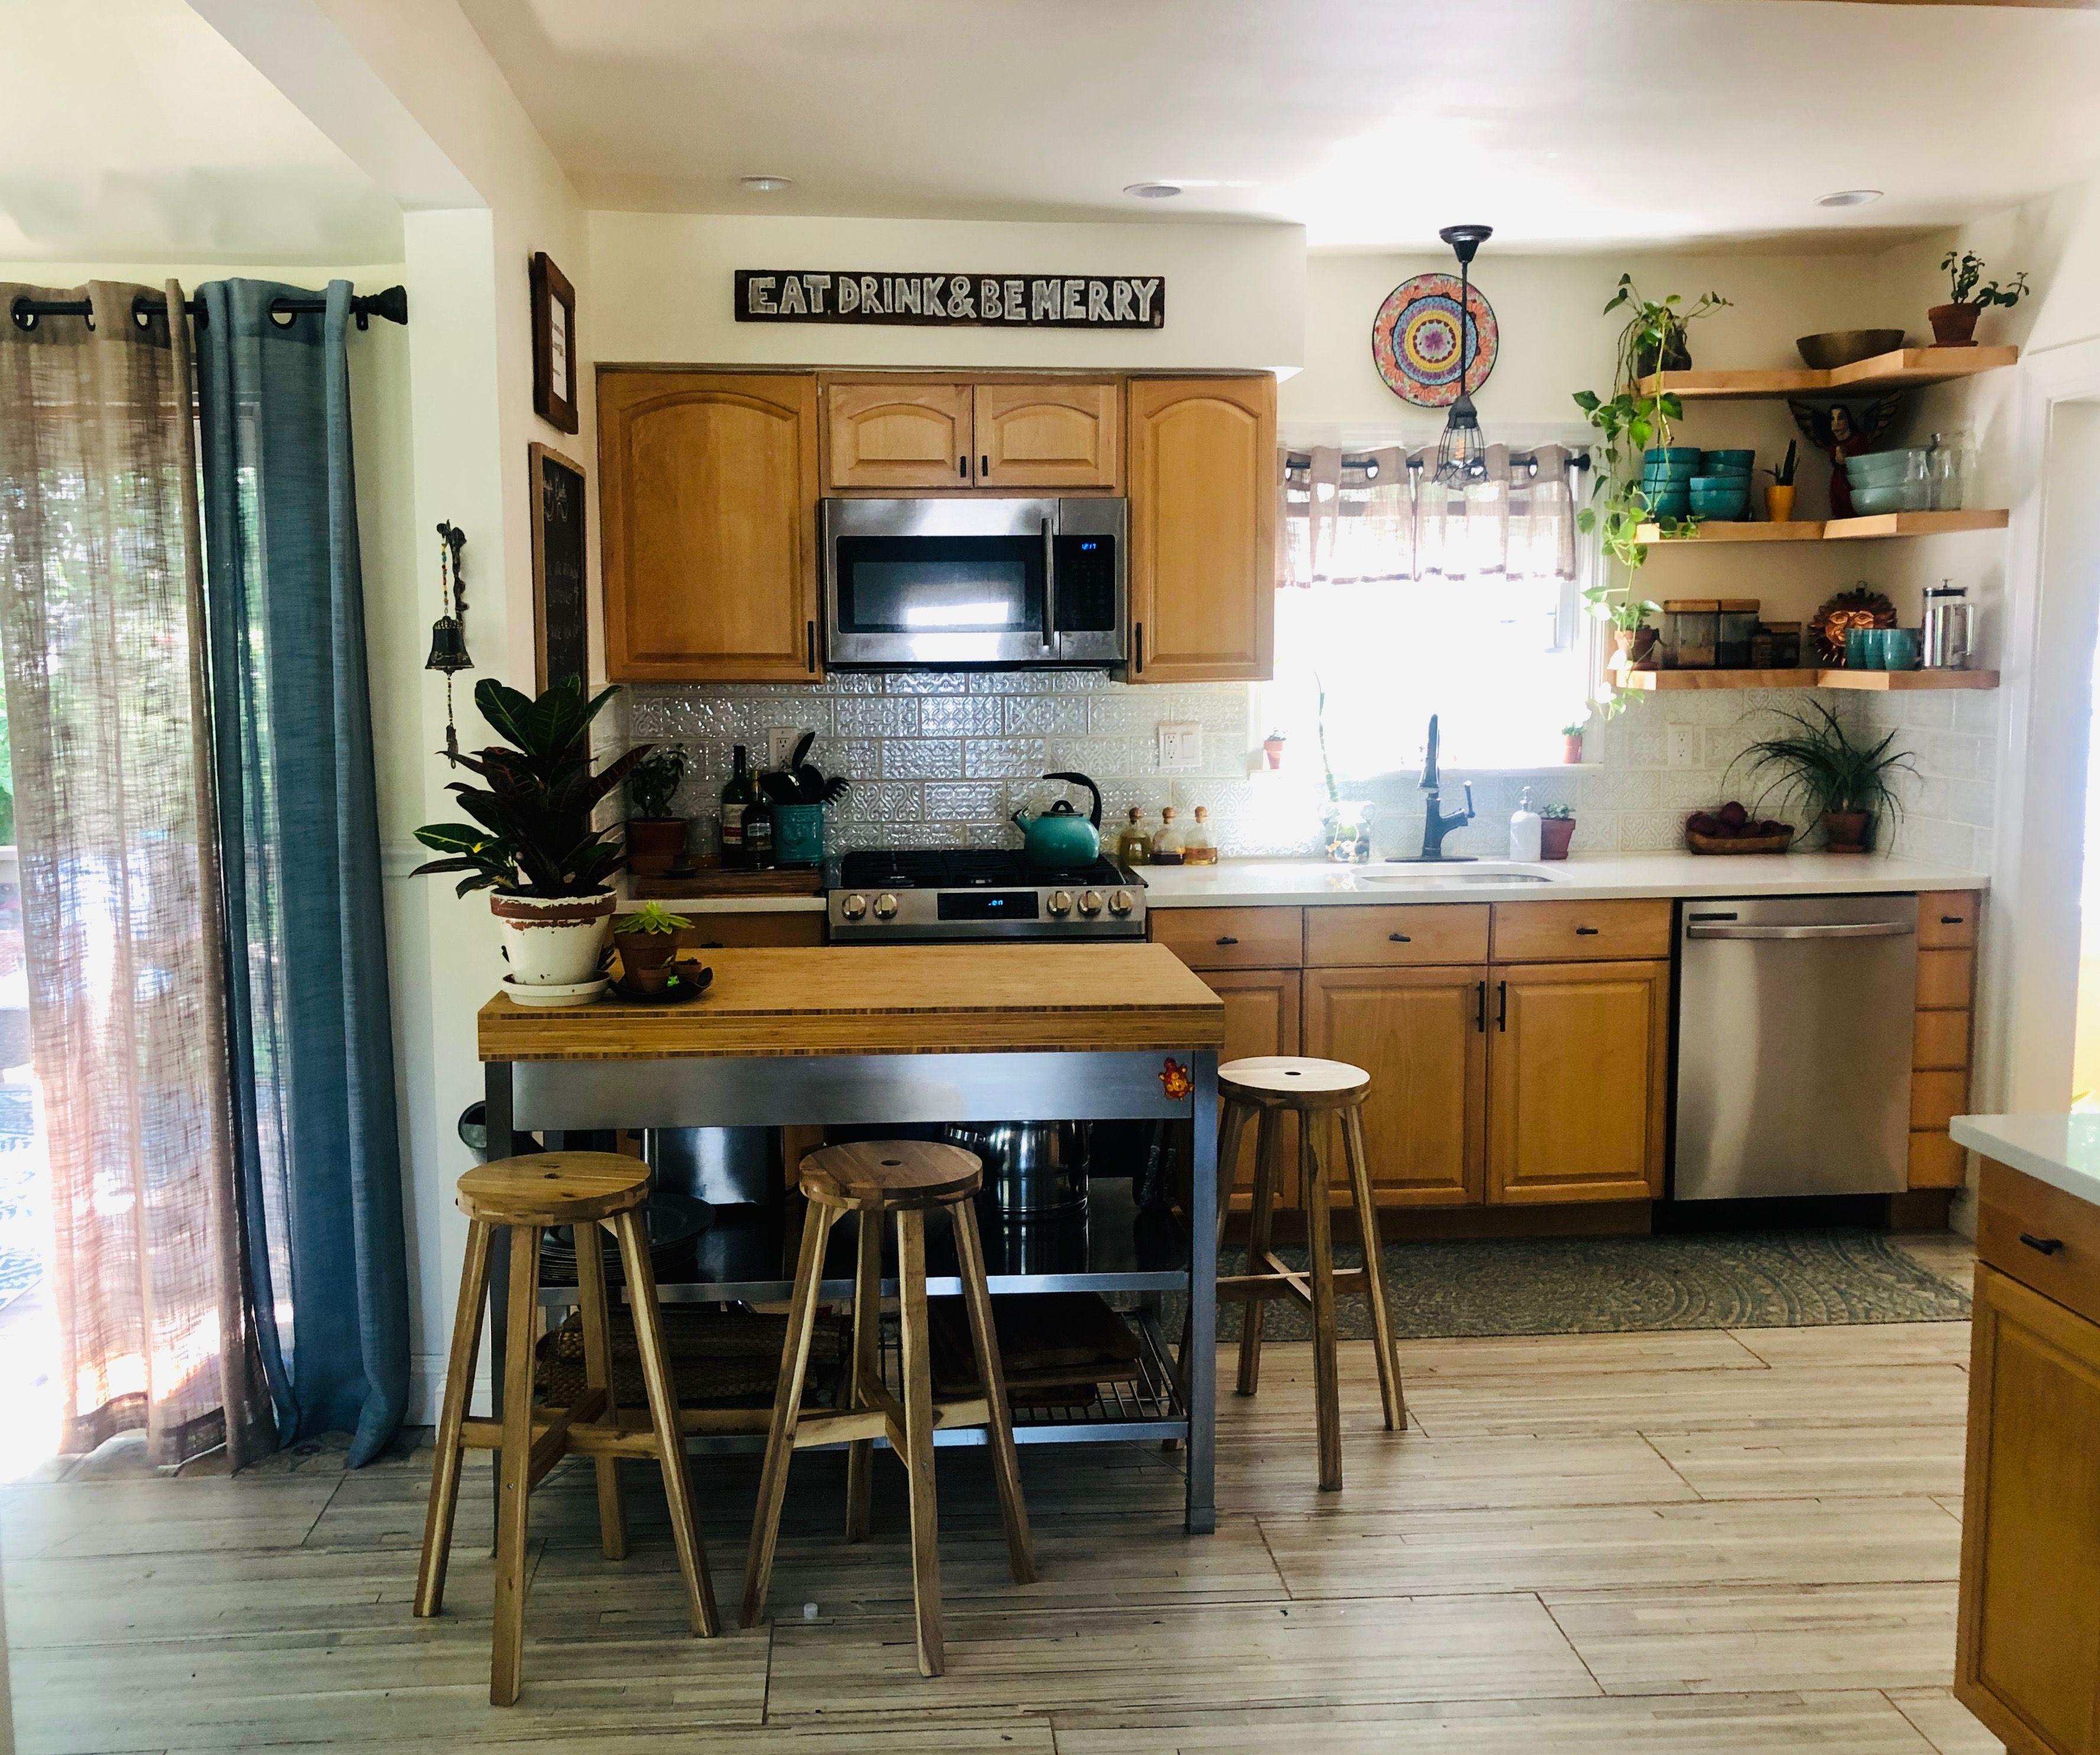 IKEA island in 2020 | Rustic kitchen, Ikea island, Home decor